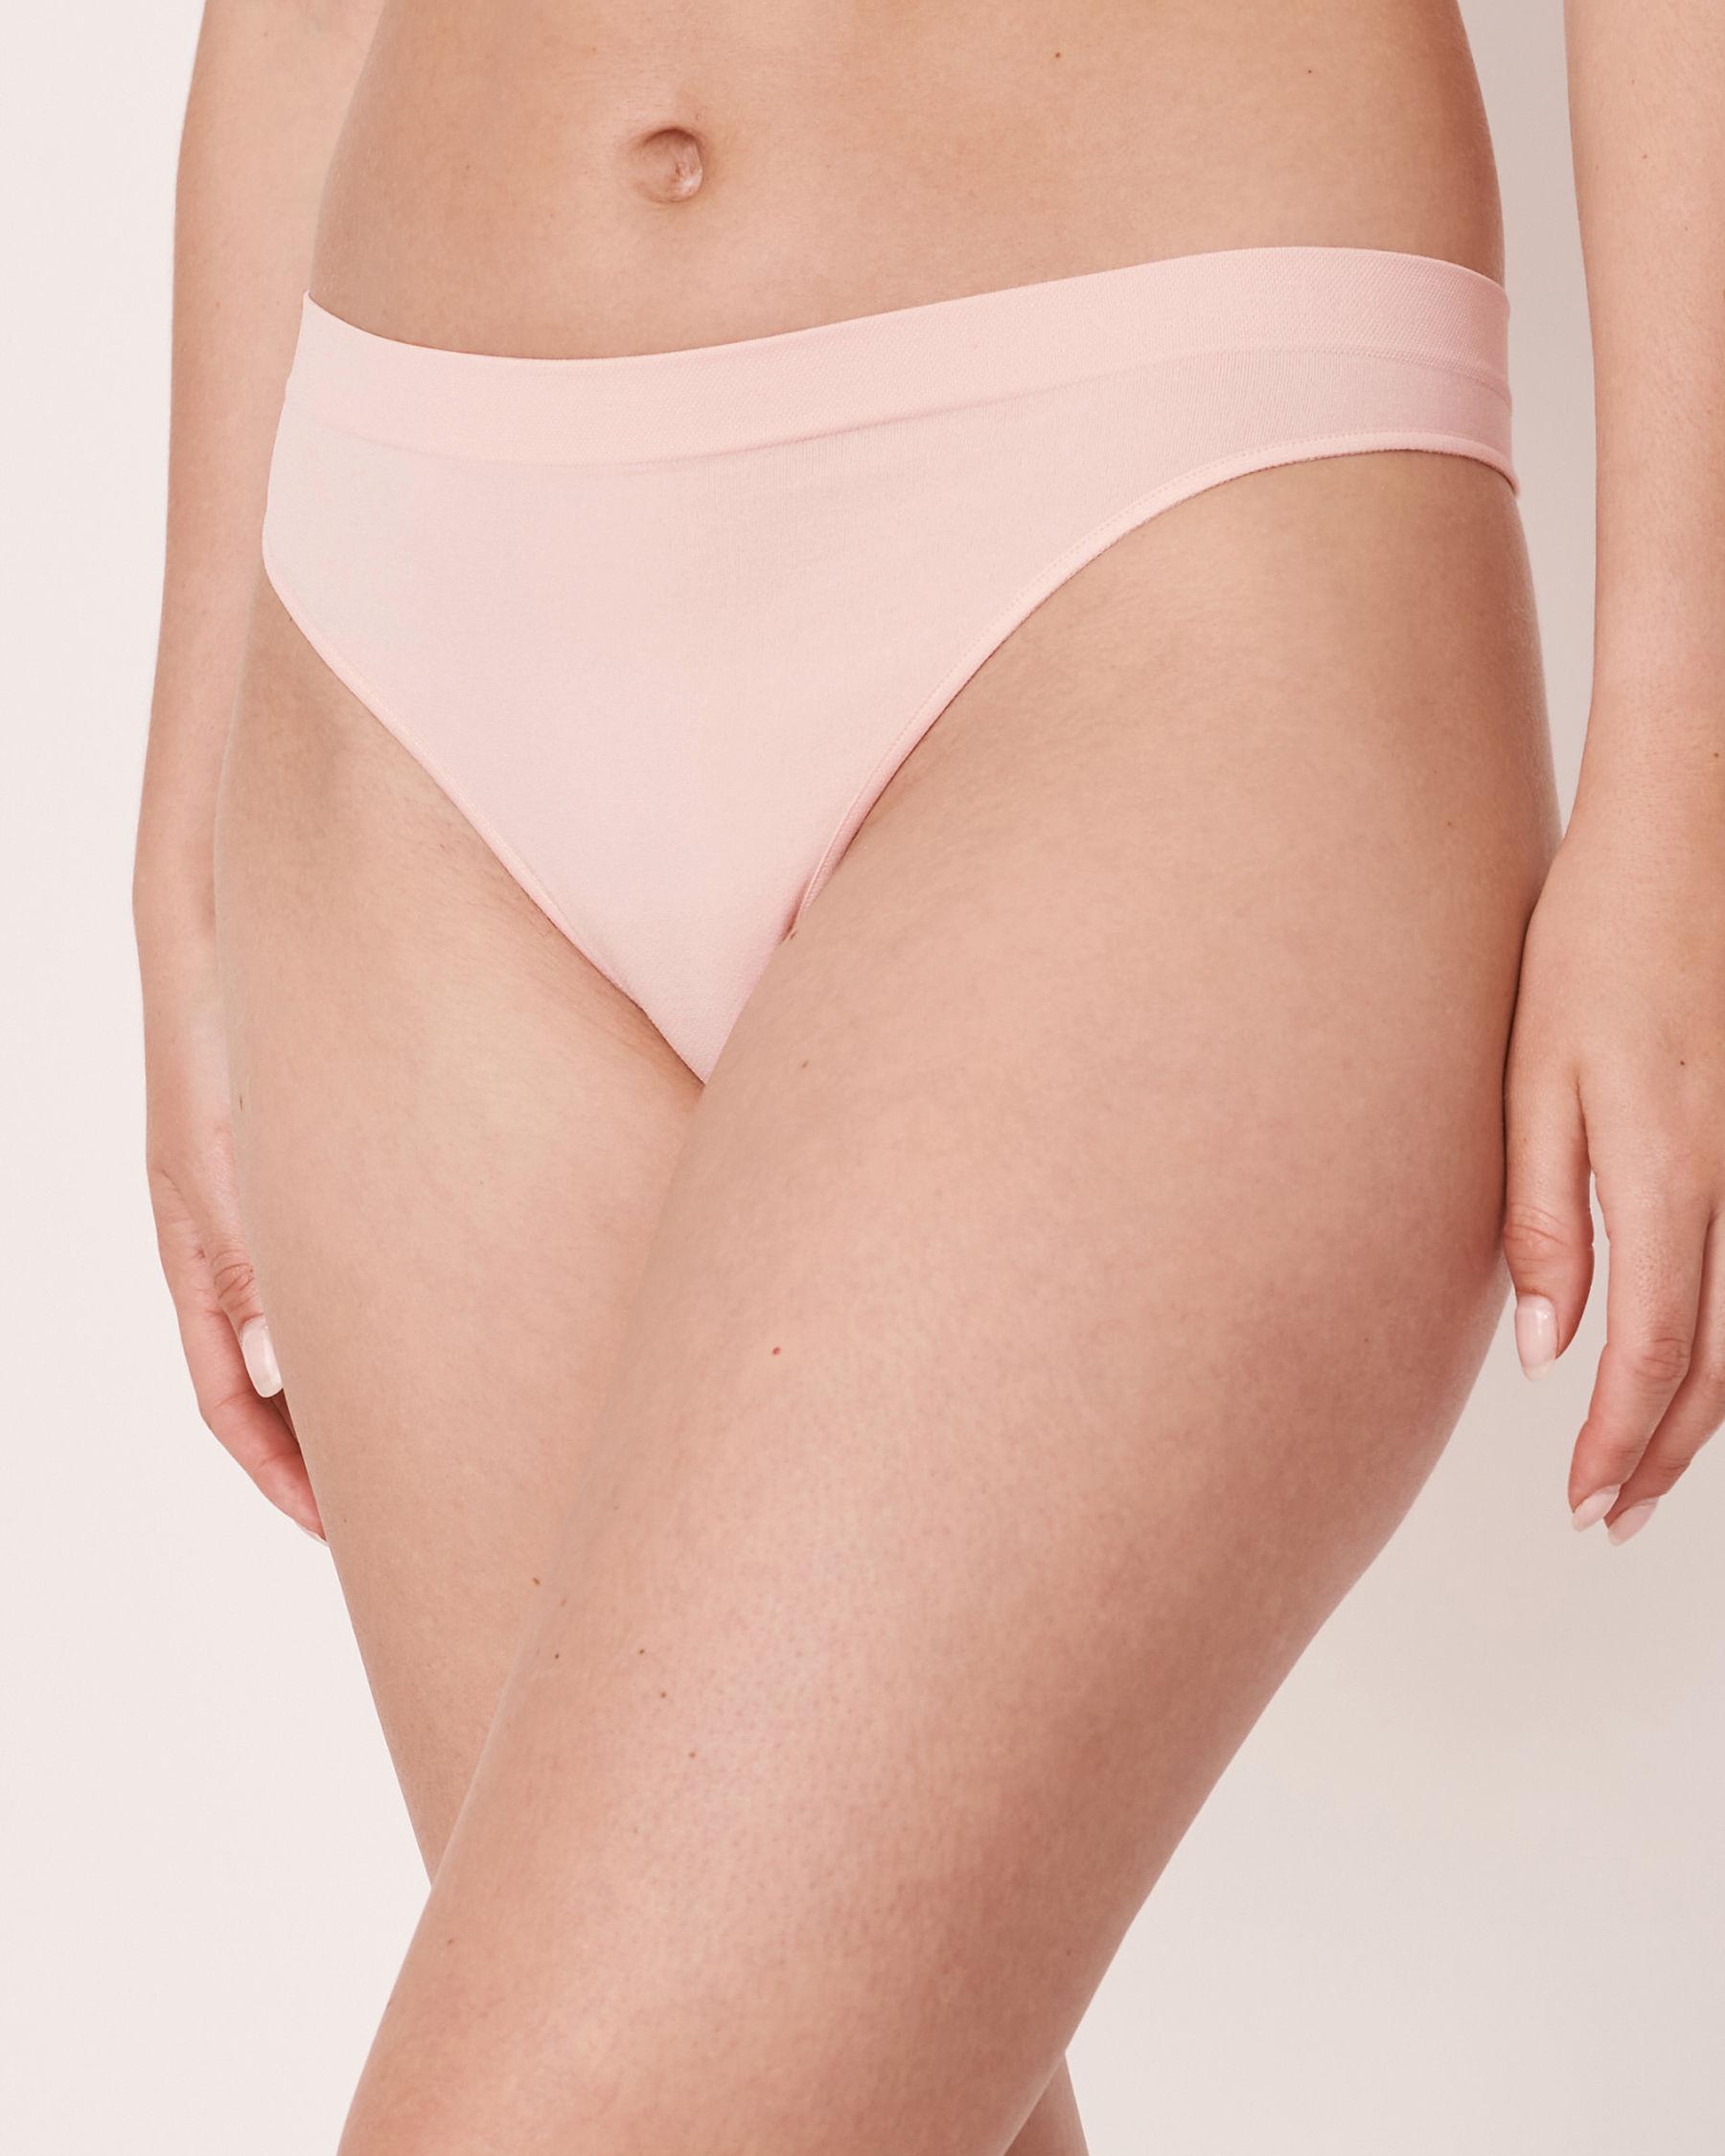 LA VIE EN ROSE Seamless Thong Panty Light pink 20200036 - View1